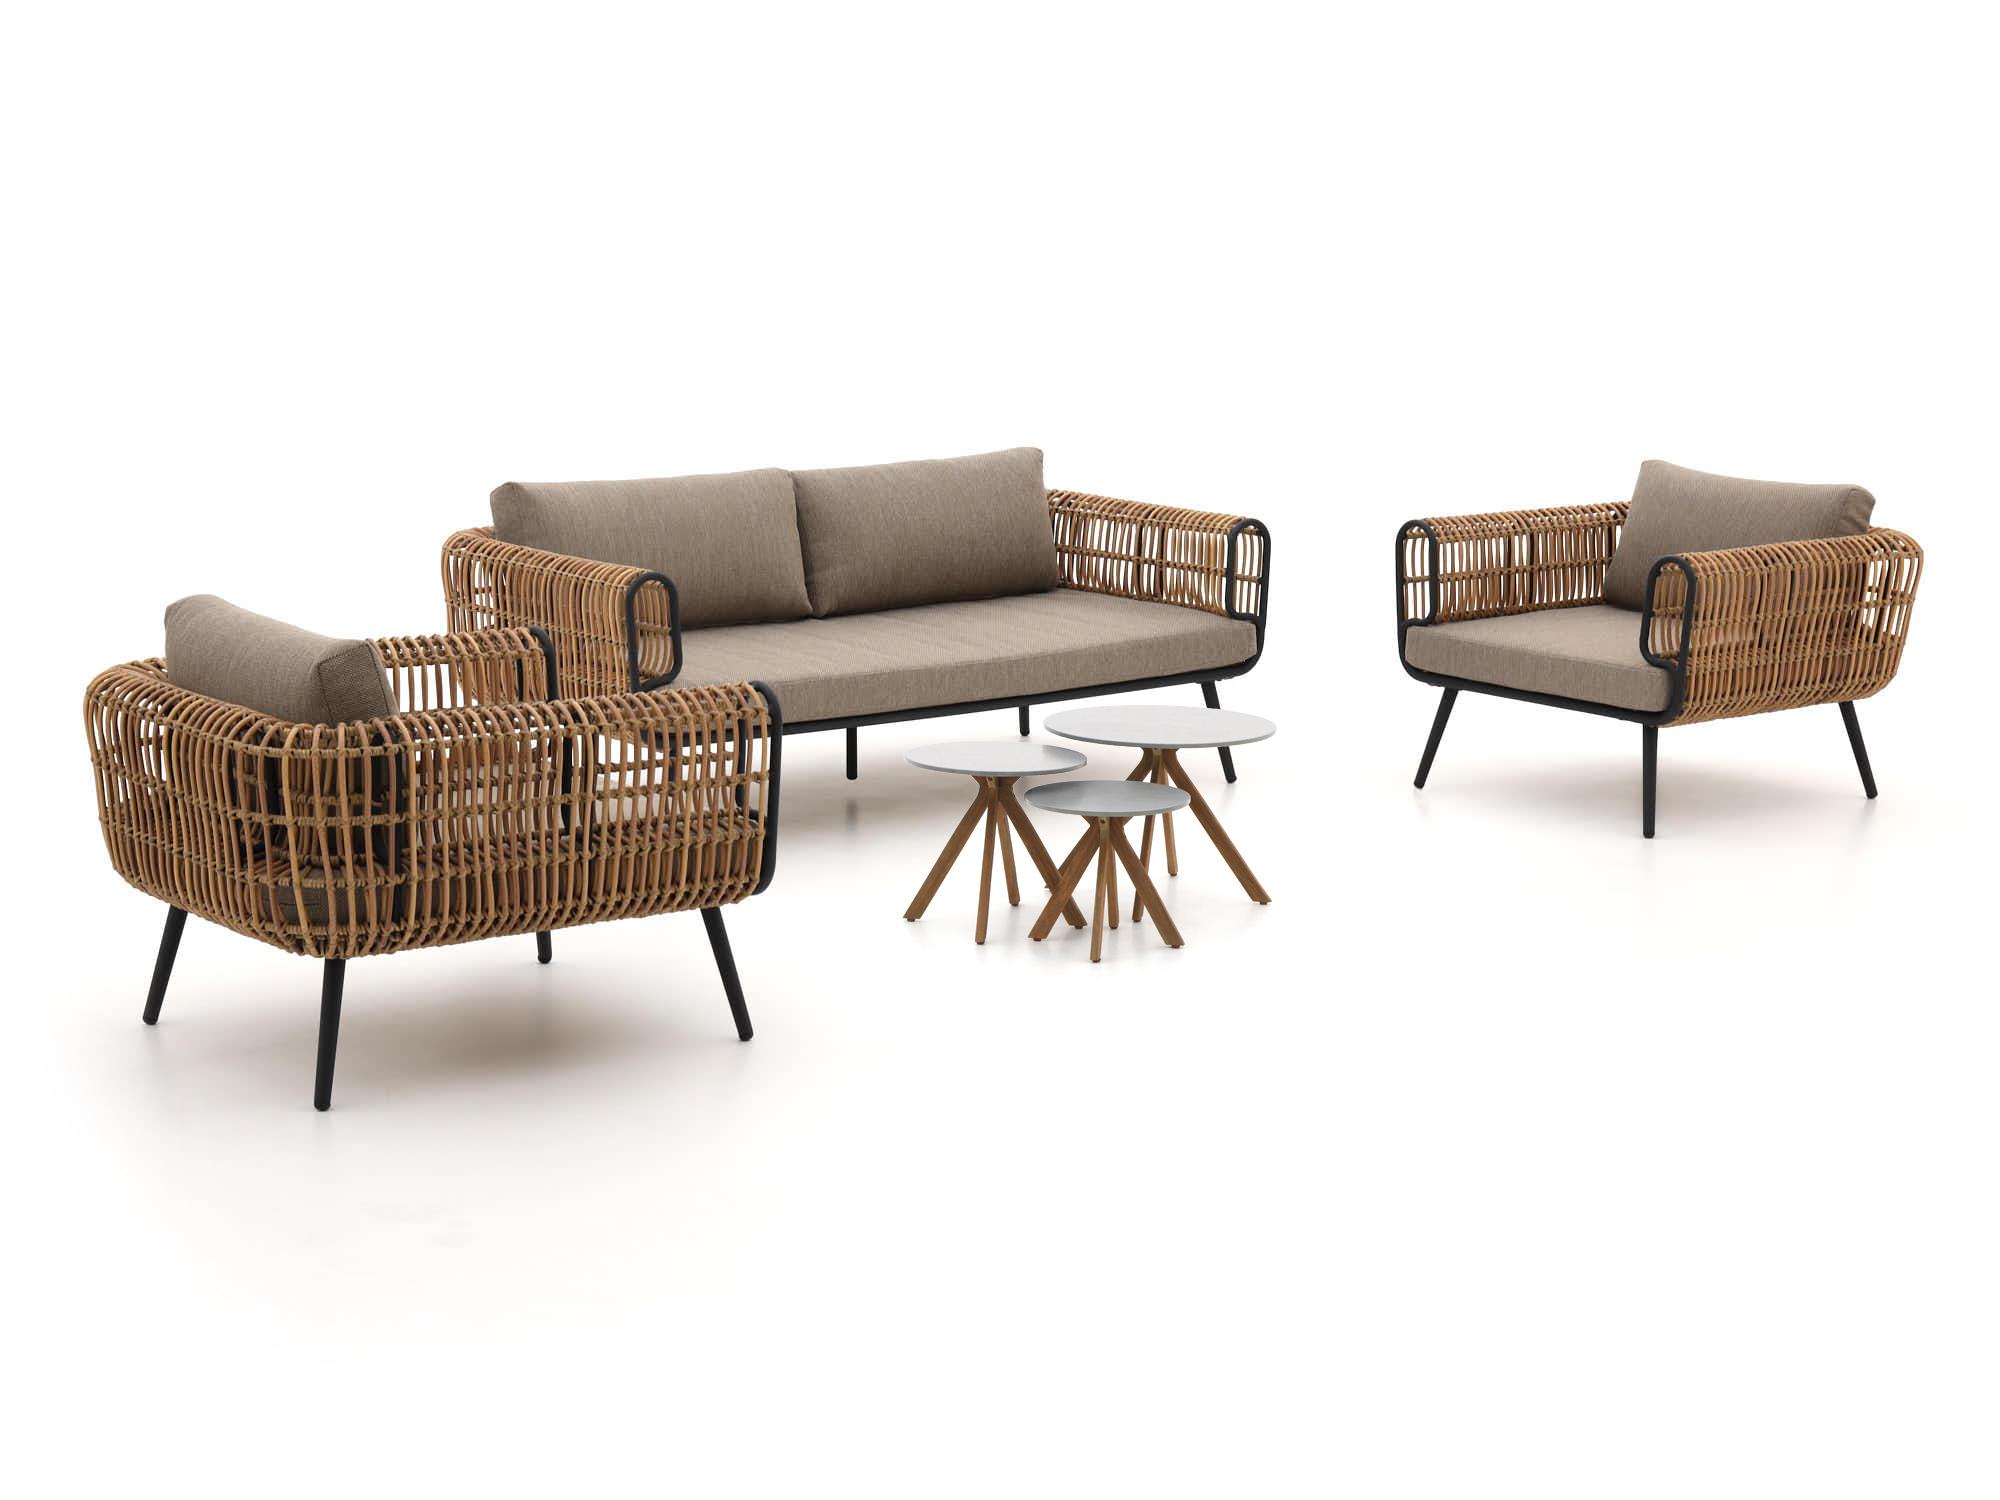 Intenso Averti/Vasaro stoel-bank loungeset 4-delig - Laagste prijsgarantie!